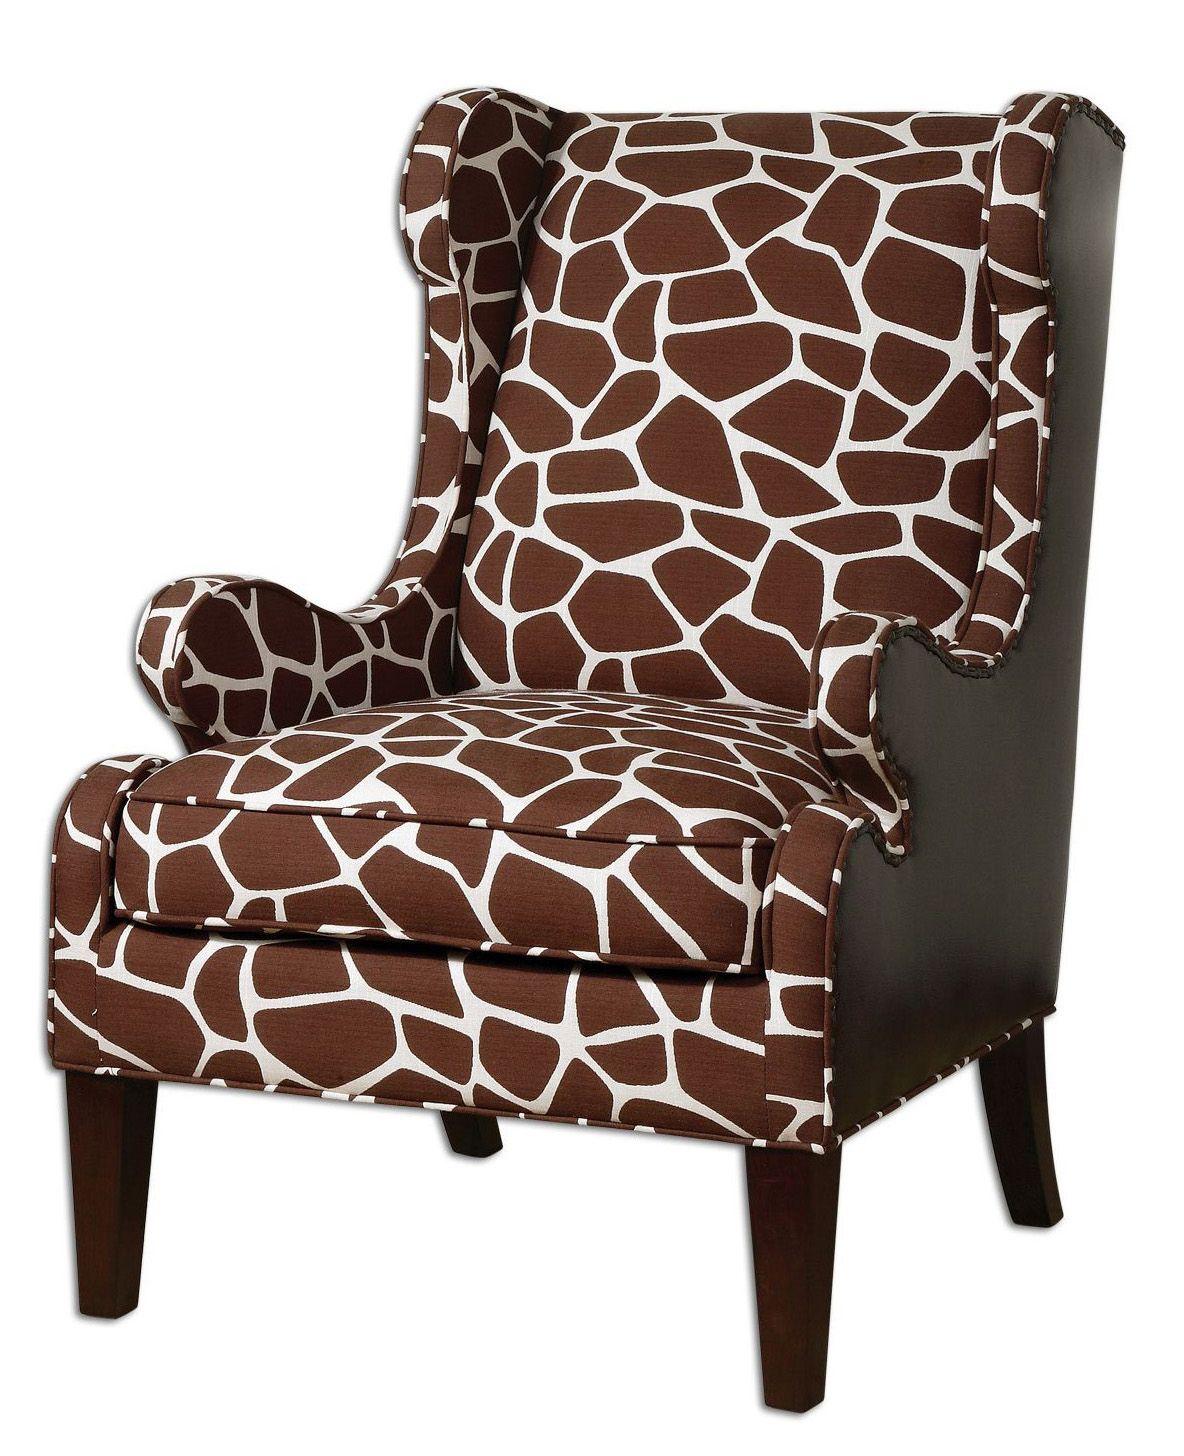 giraffe print chair electric prop armchair no way too bad it s over 1000 hahaha